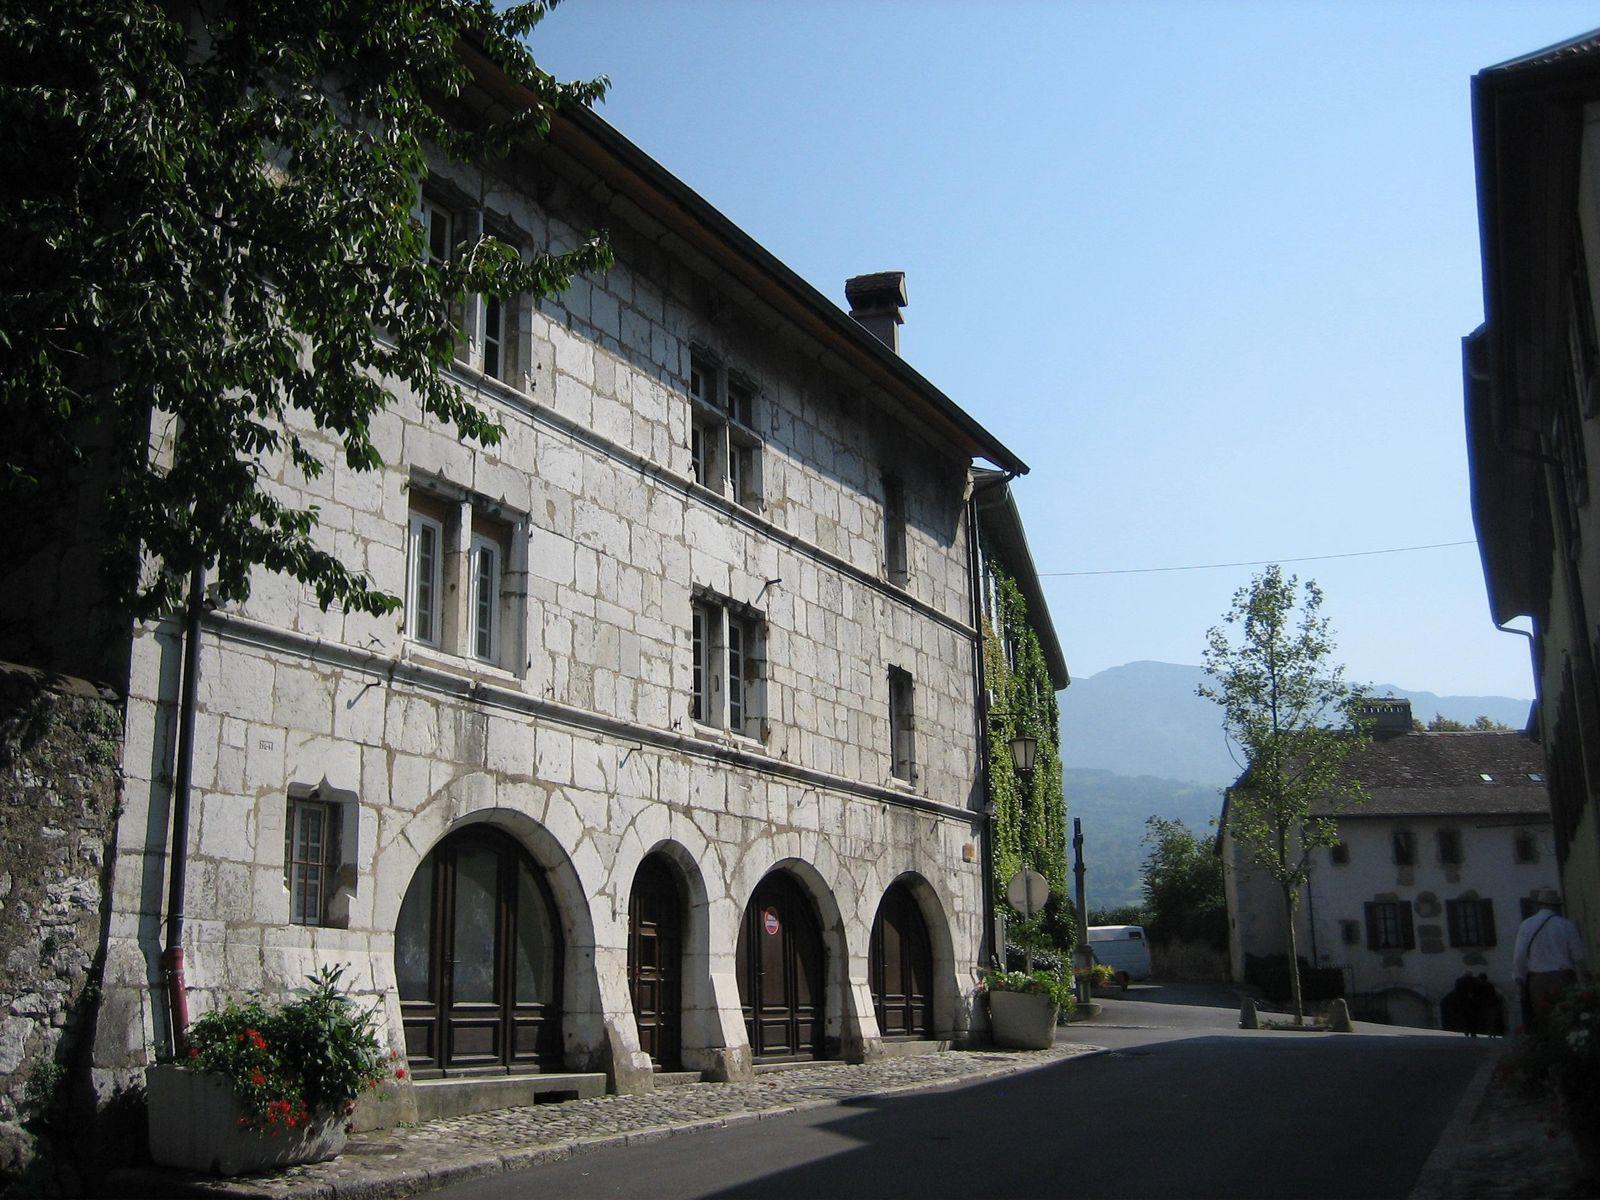 La Roche-sur-Foron (1)